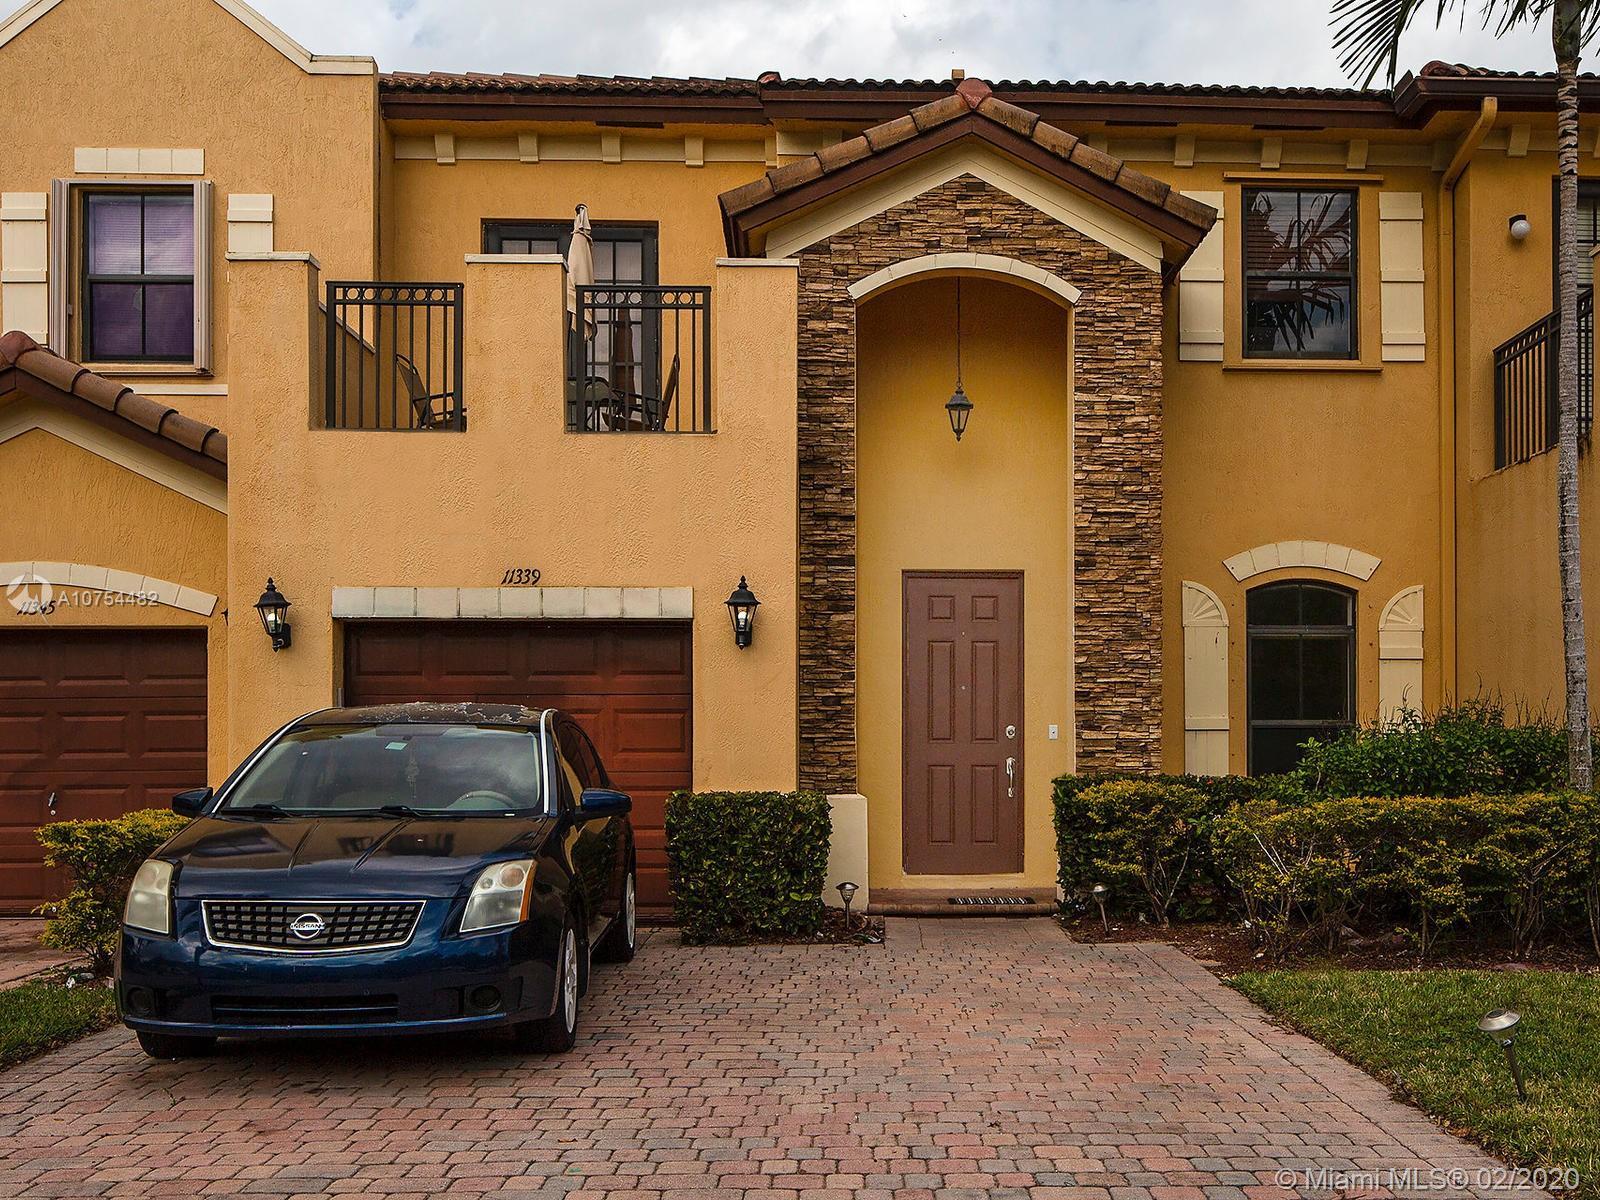 11339 SW 236th Ln #11339, Homestead, FL 33032 - Homestead, FL real estate listing